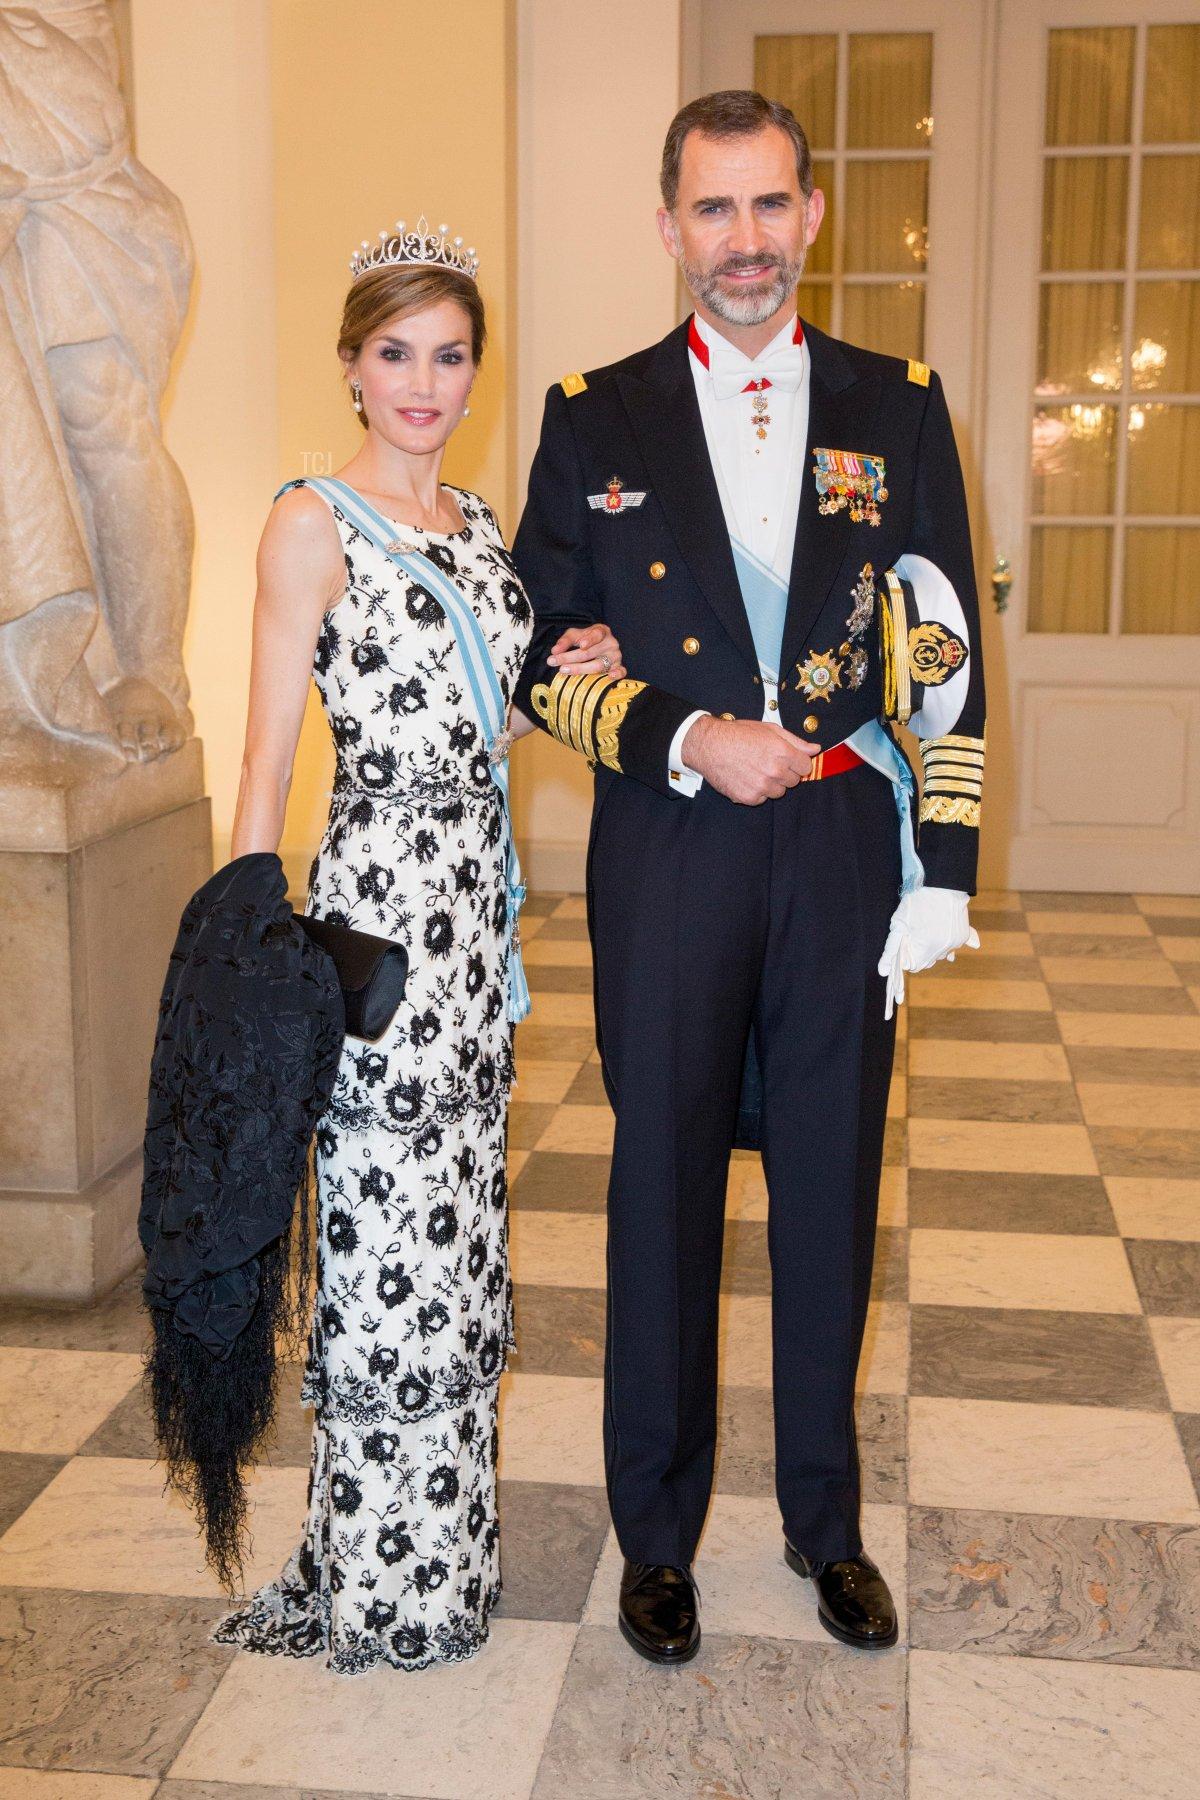 Copenhagen, Denmark. 15th Apr, 2015. King Felipe and Queen Letizia of Spain attend the gala dinner for the Danish Queen Margrethe's 75th birthday at Christiansborg Palace in Copenhagen, Denmark, 15 April 2015